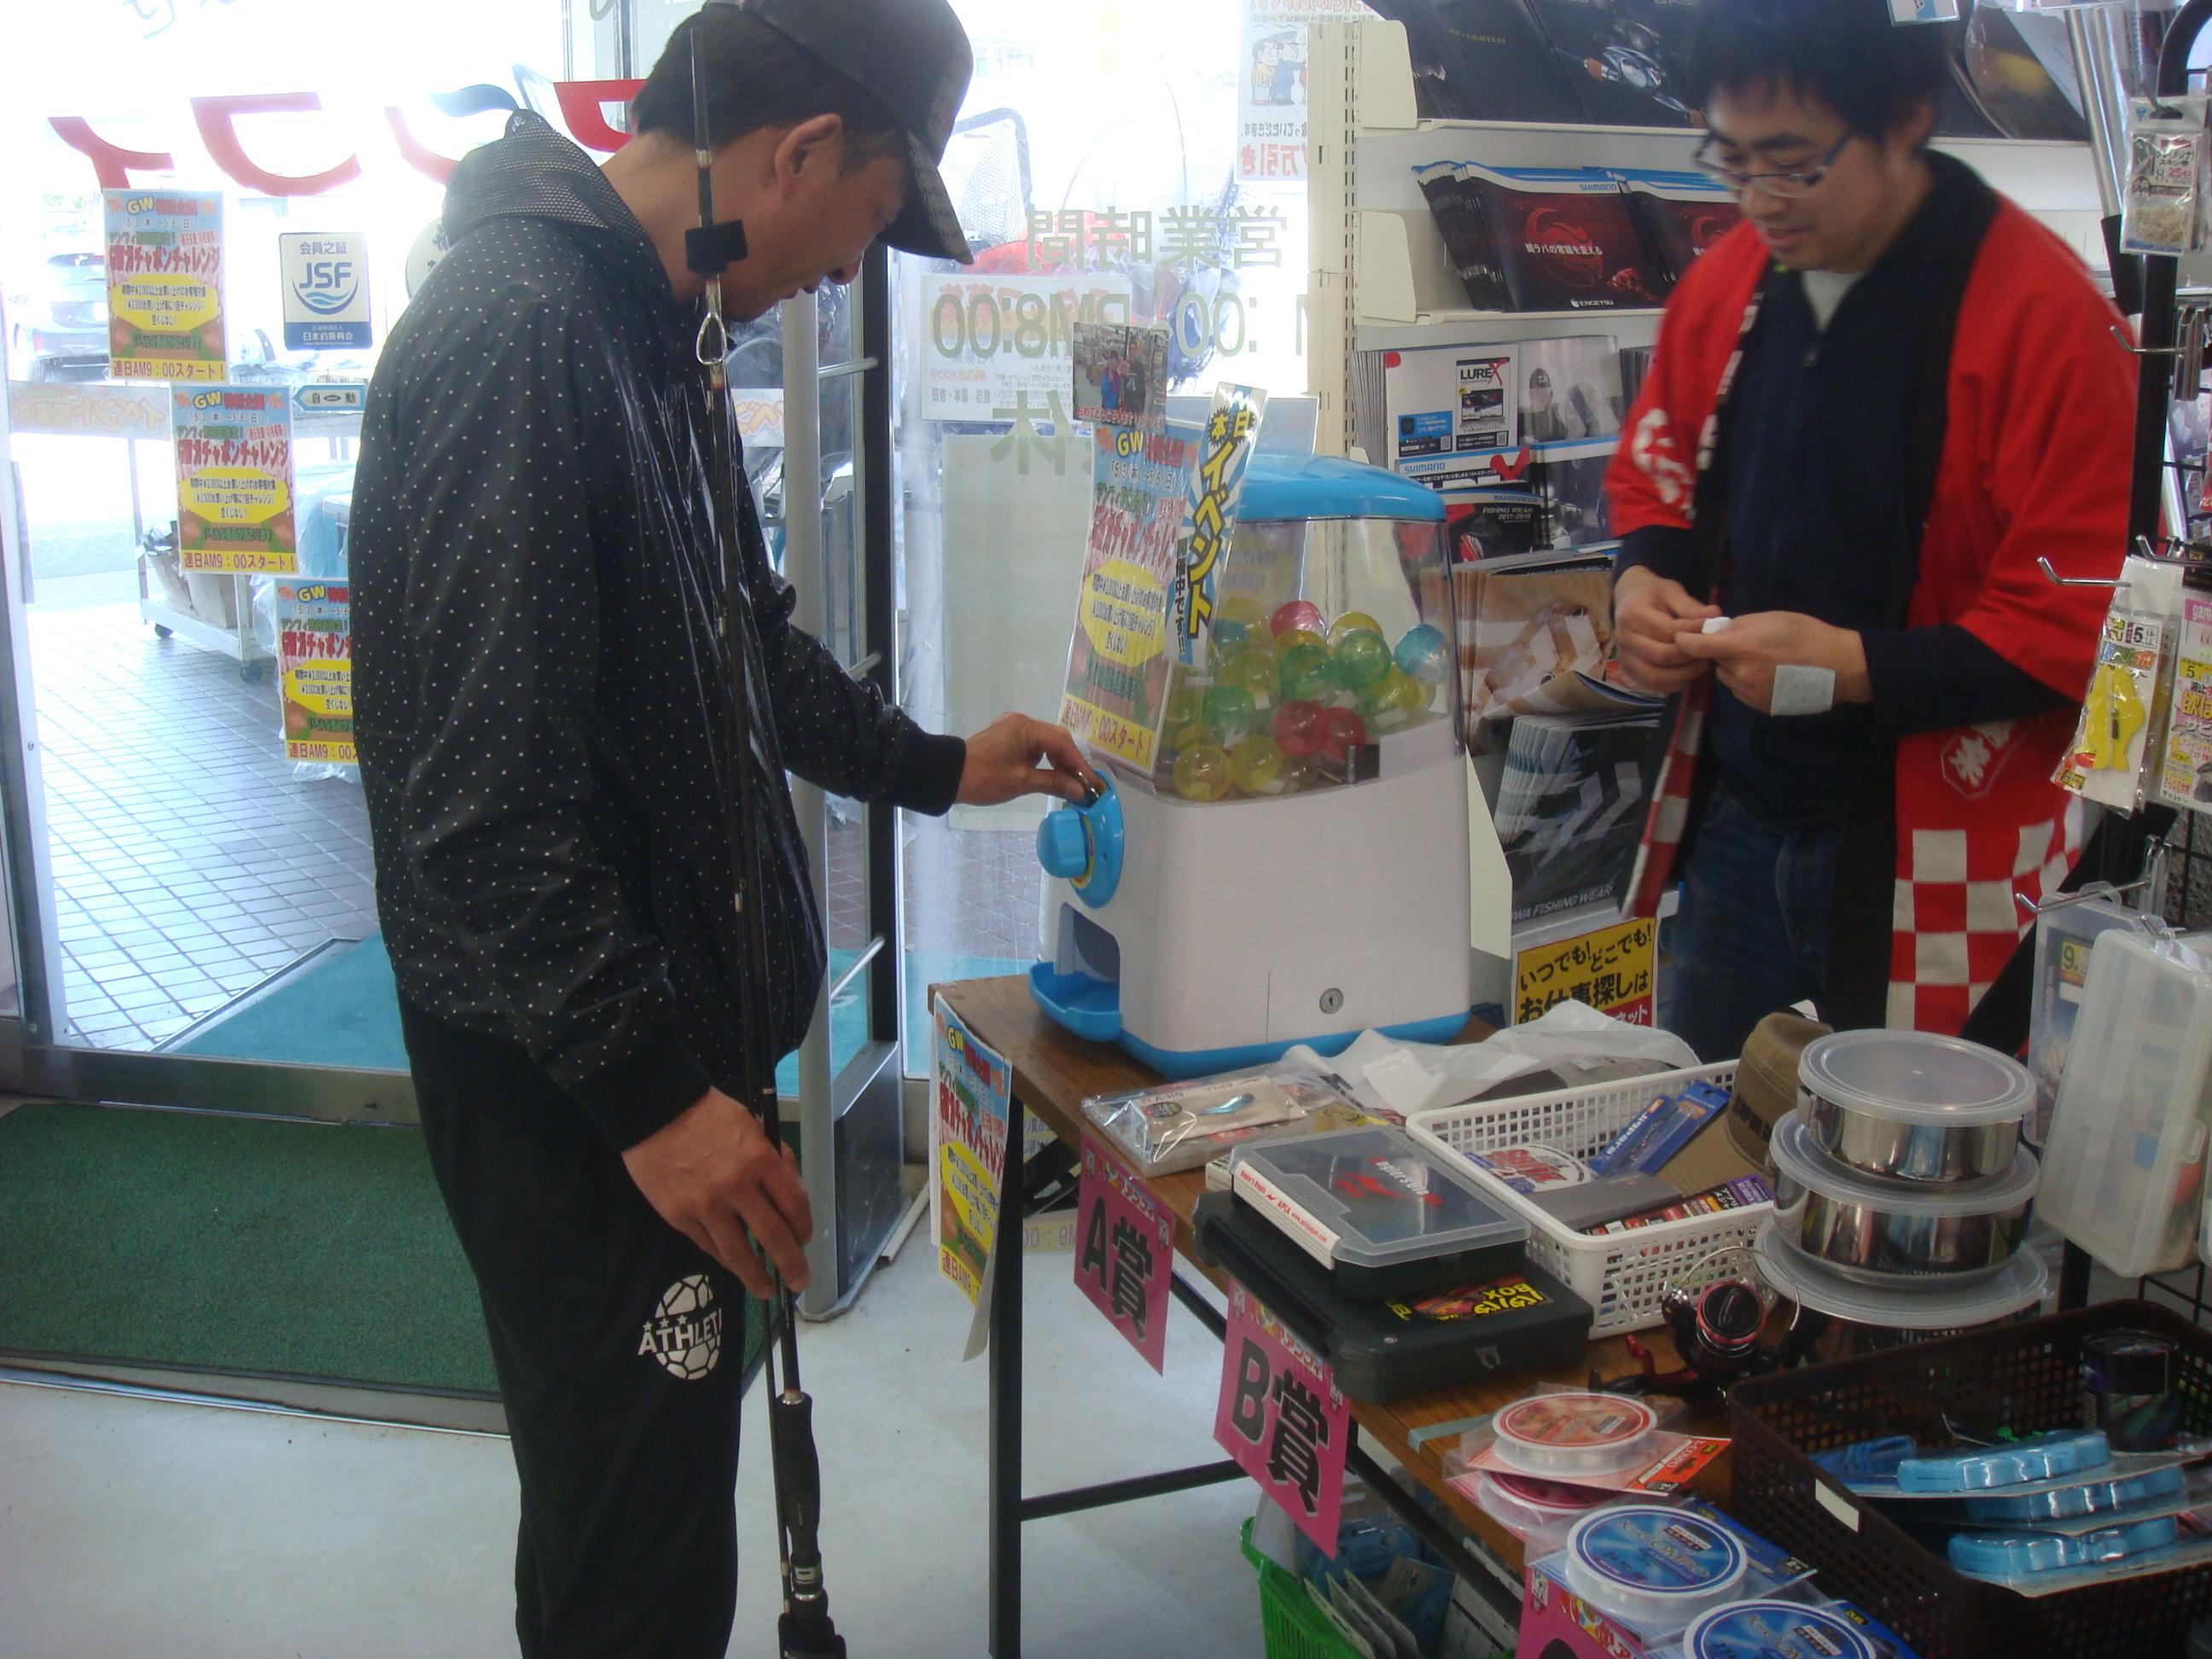 http://www.e-angle.co.jp/shop/news/DSC02969.JPG